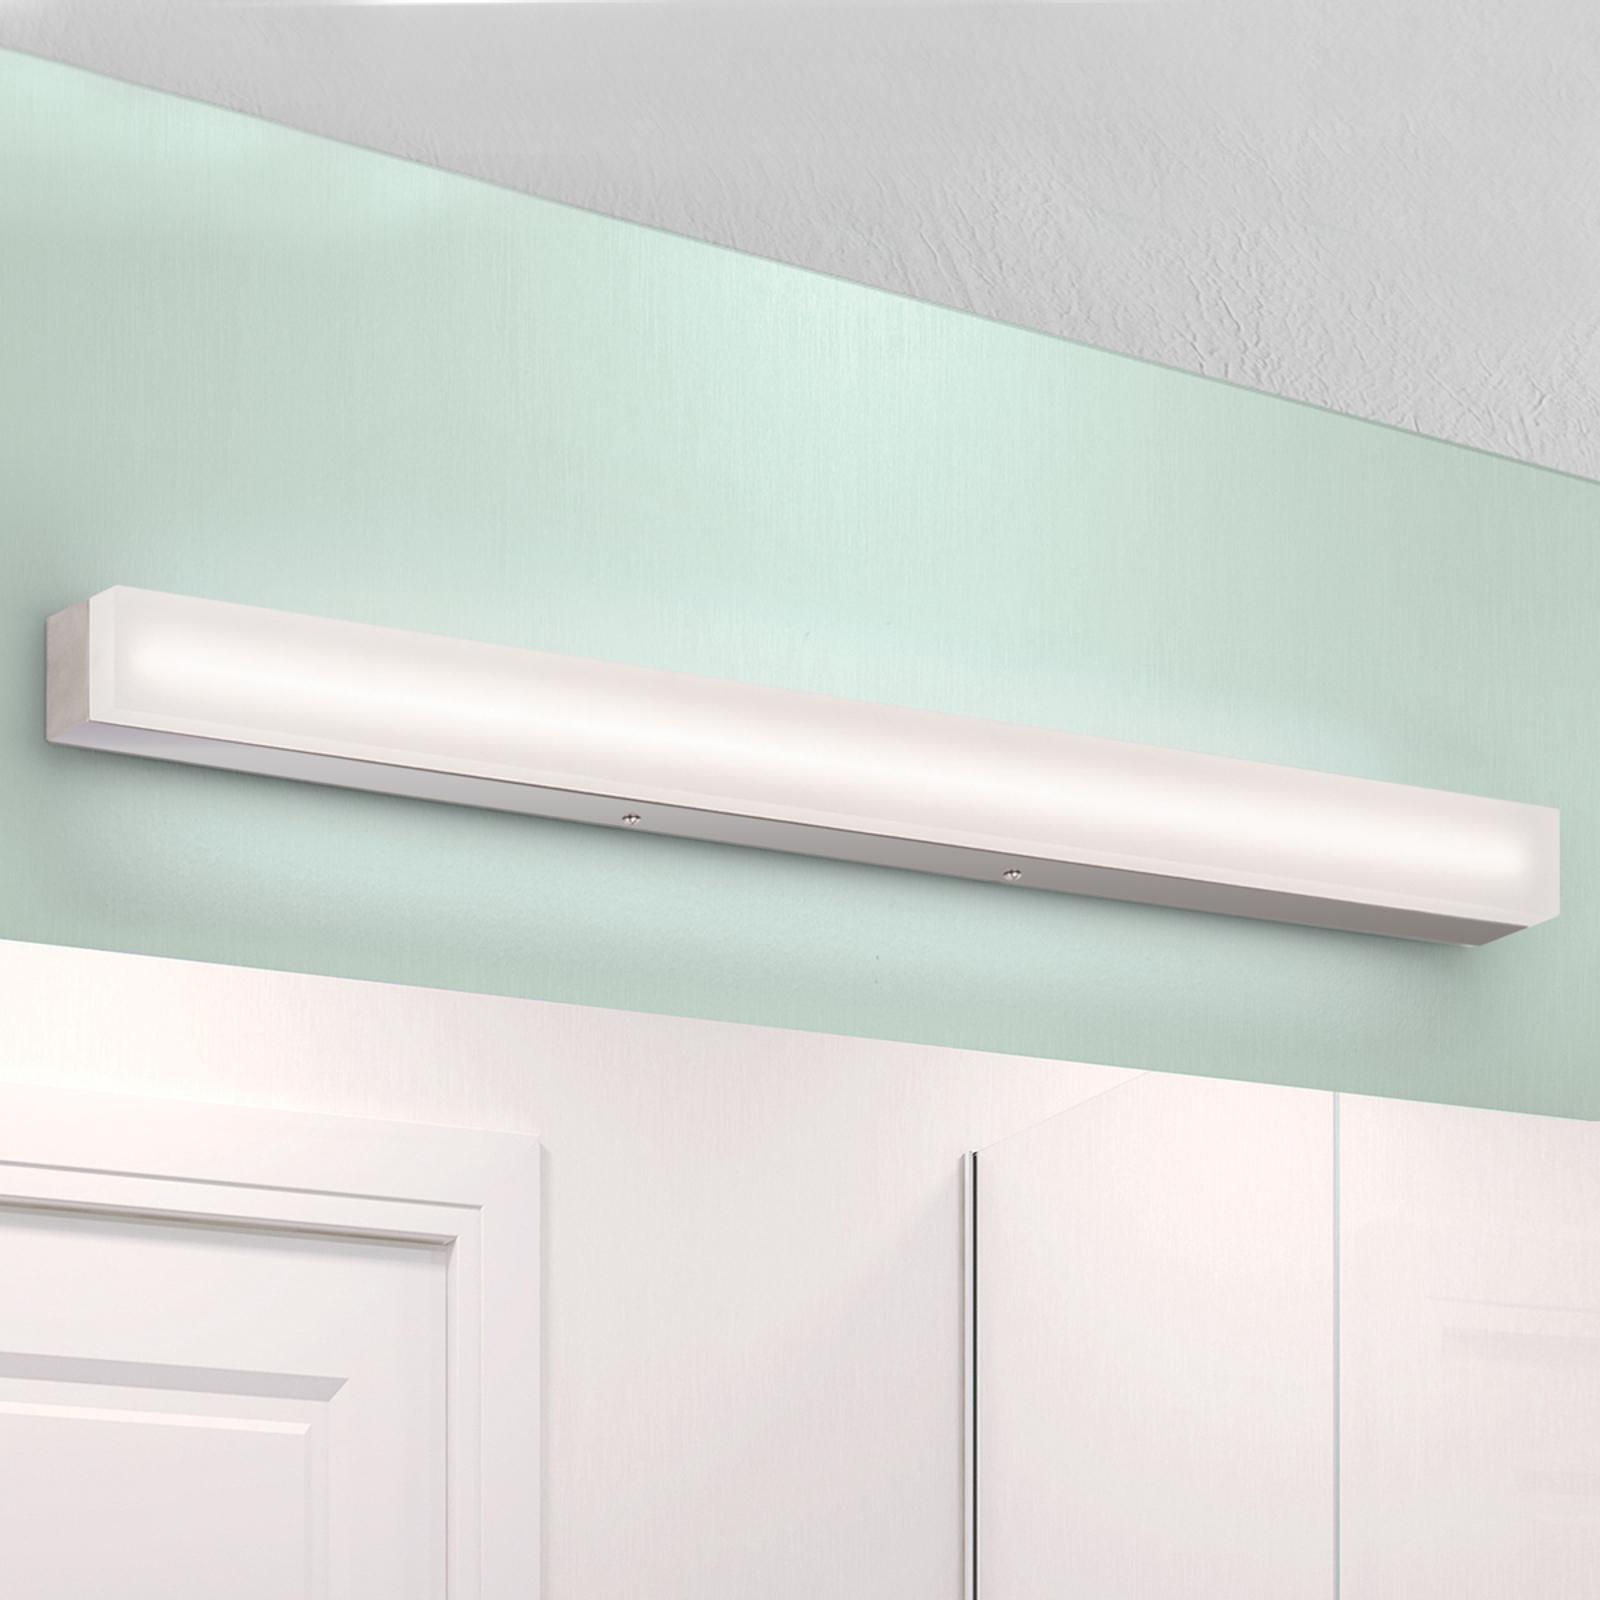 LED-seinävalaisin Nane, leveys 75 cm